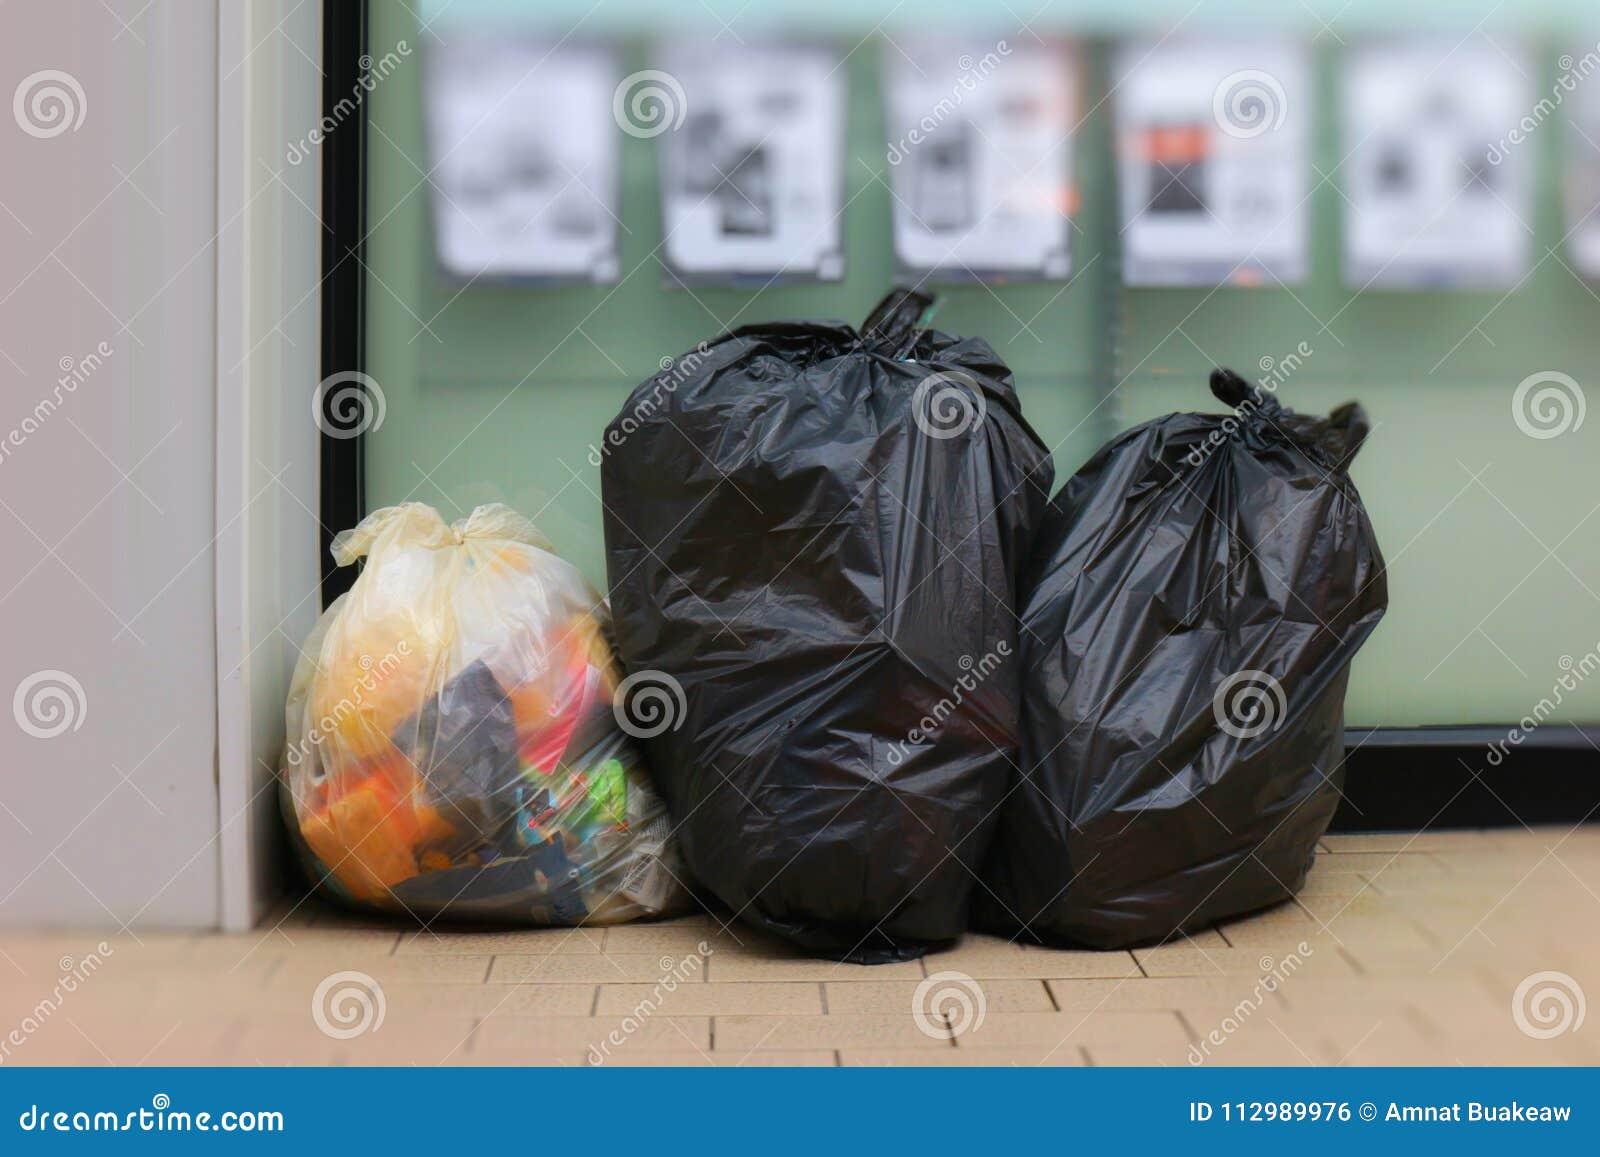 Three Trash Bags, Garbage bag black placed front convenience store, Bin, Trash, trash bag, trash on sidewalk, Three bags bin of ga